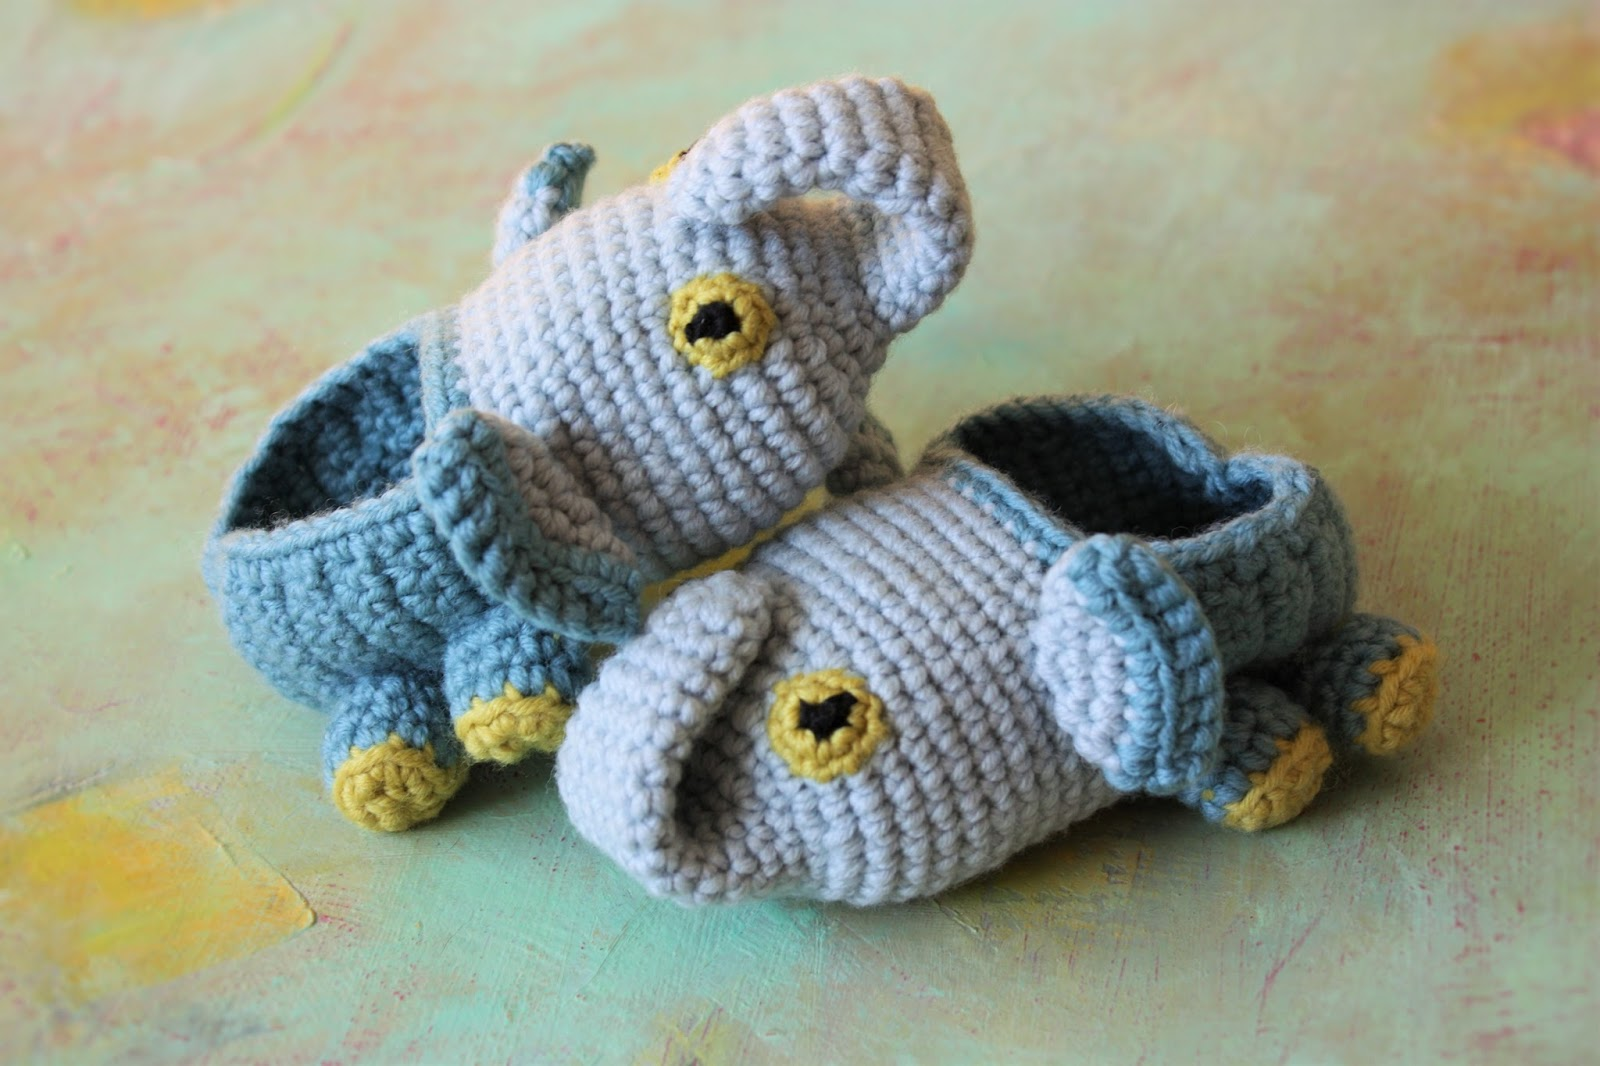 HAPPYAMIGURUMI: Fun Feet, Creature Feetures - 30 Crochet ...